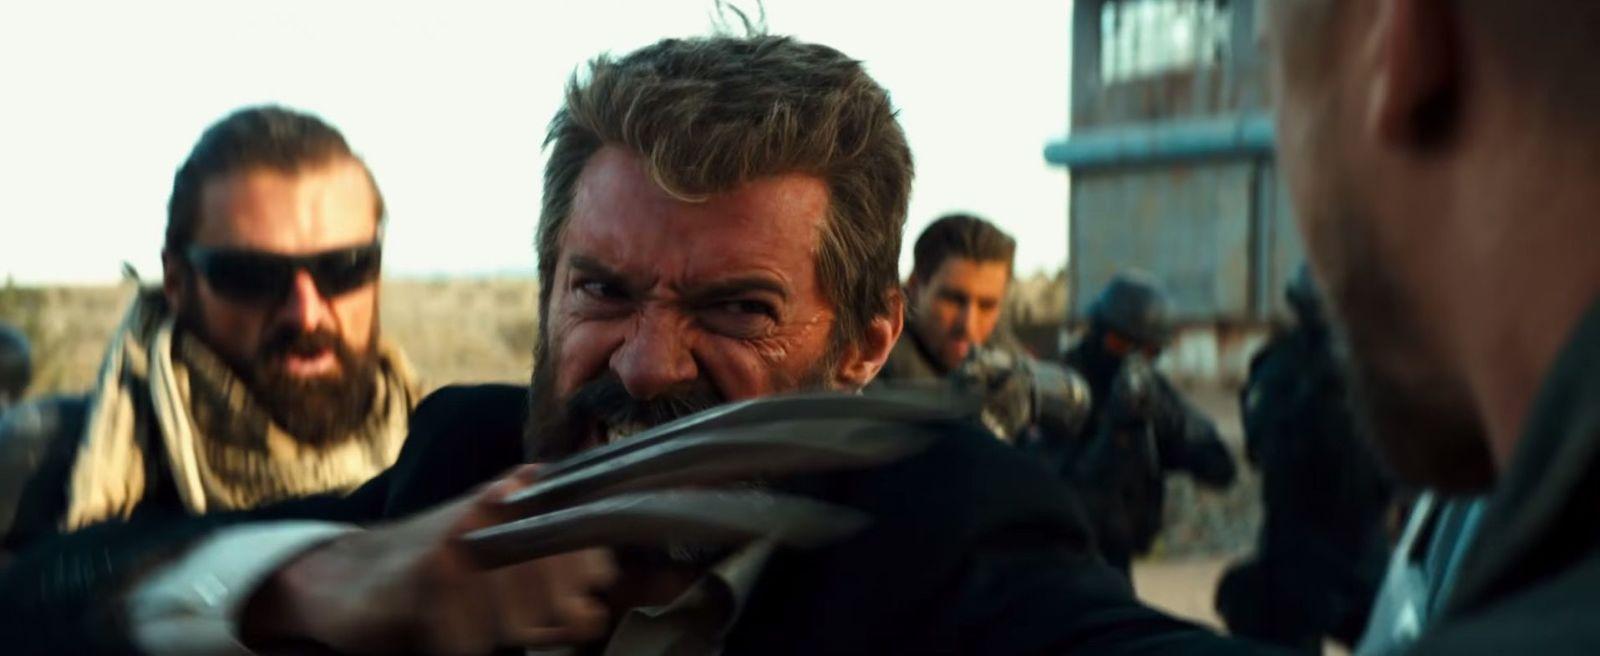 Logan-wolverine-hugh-jackman